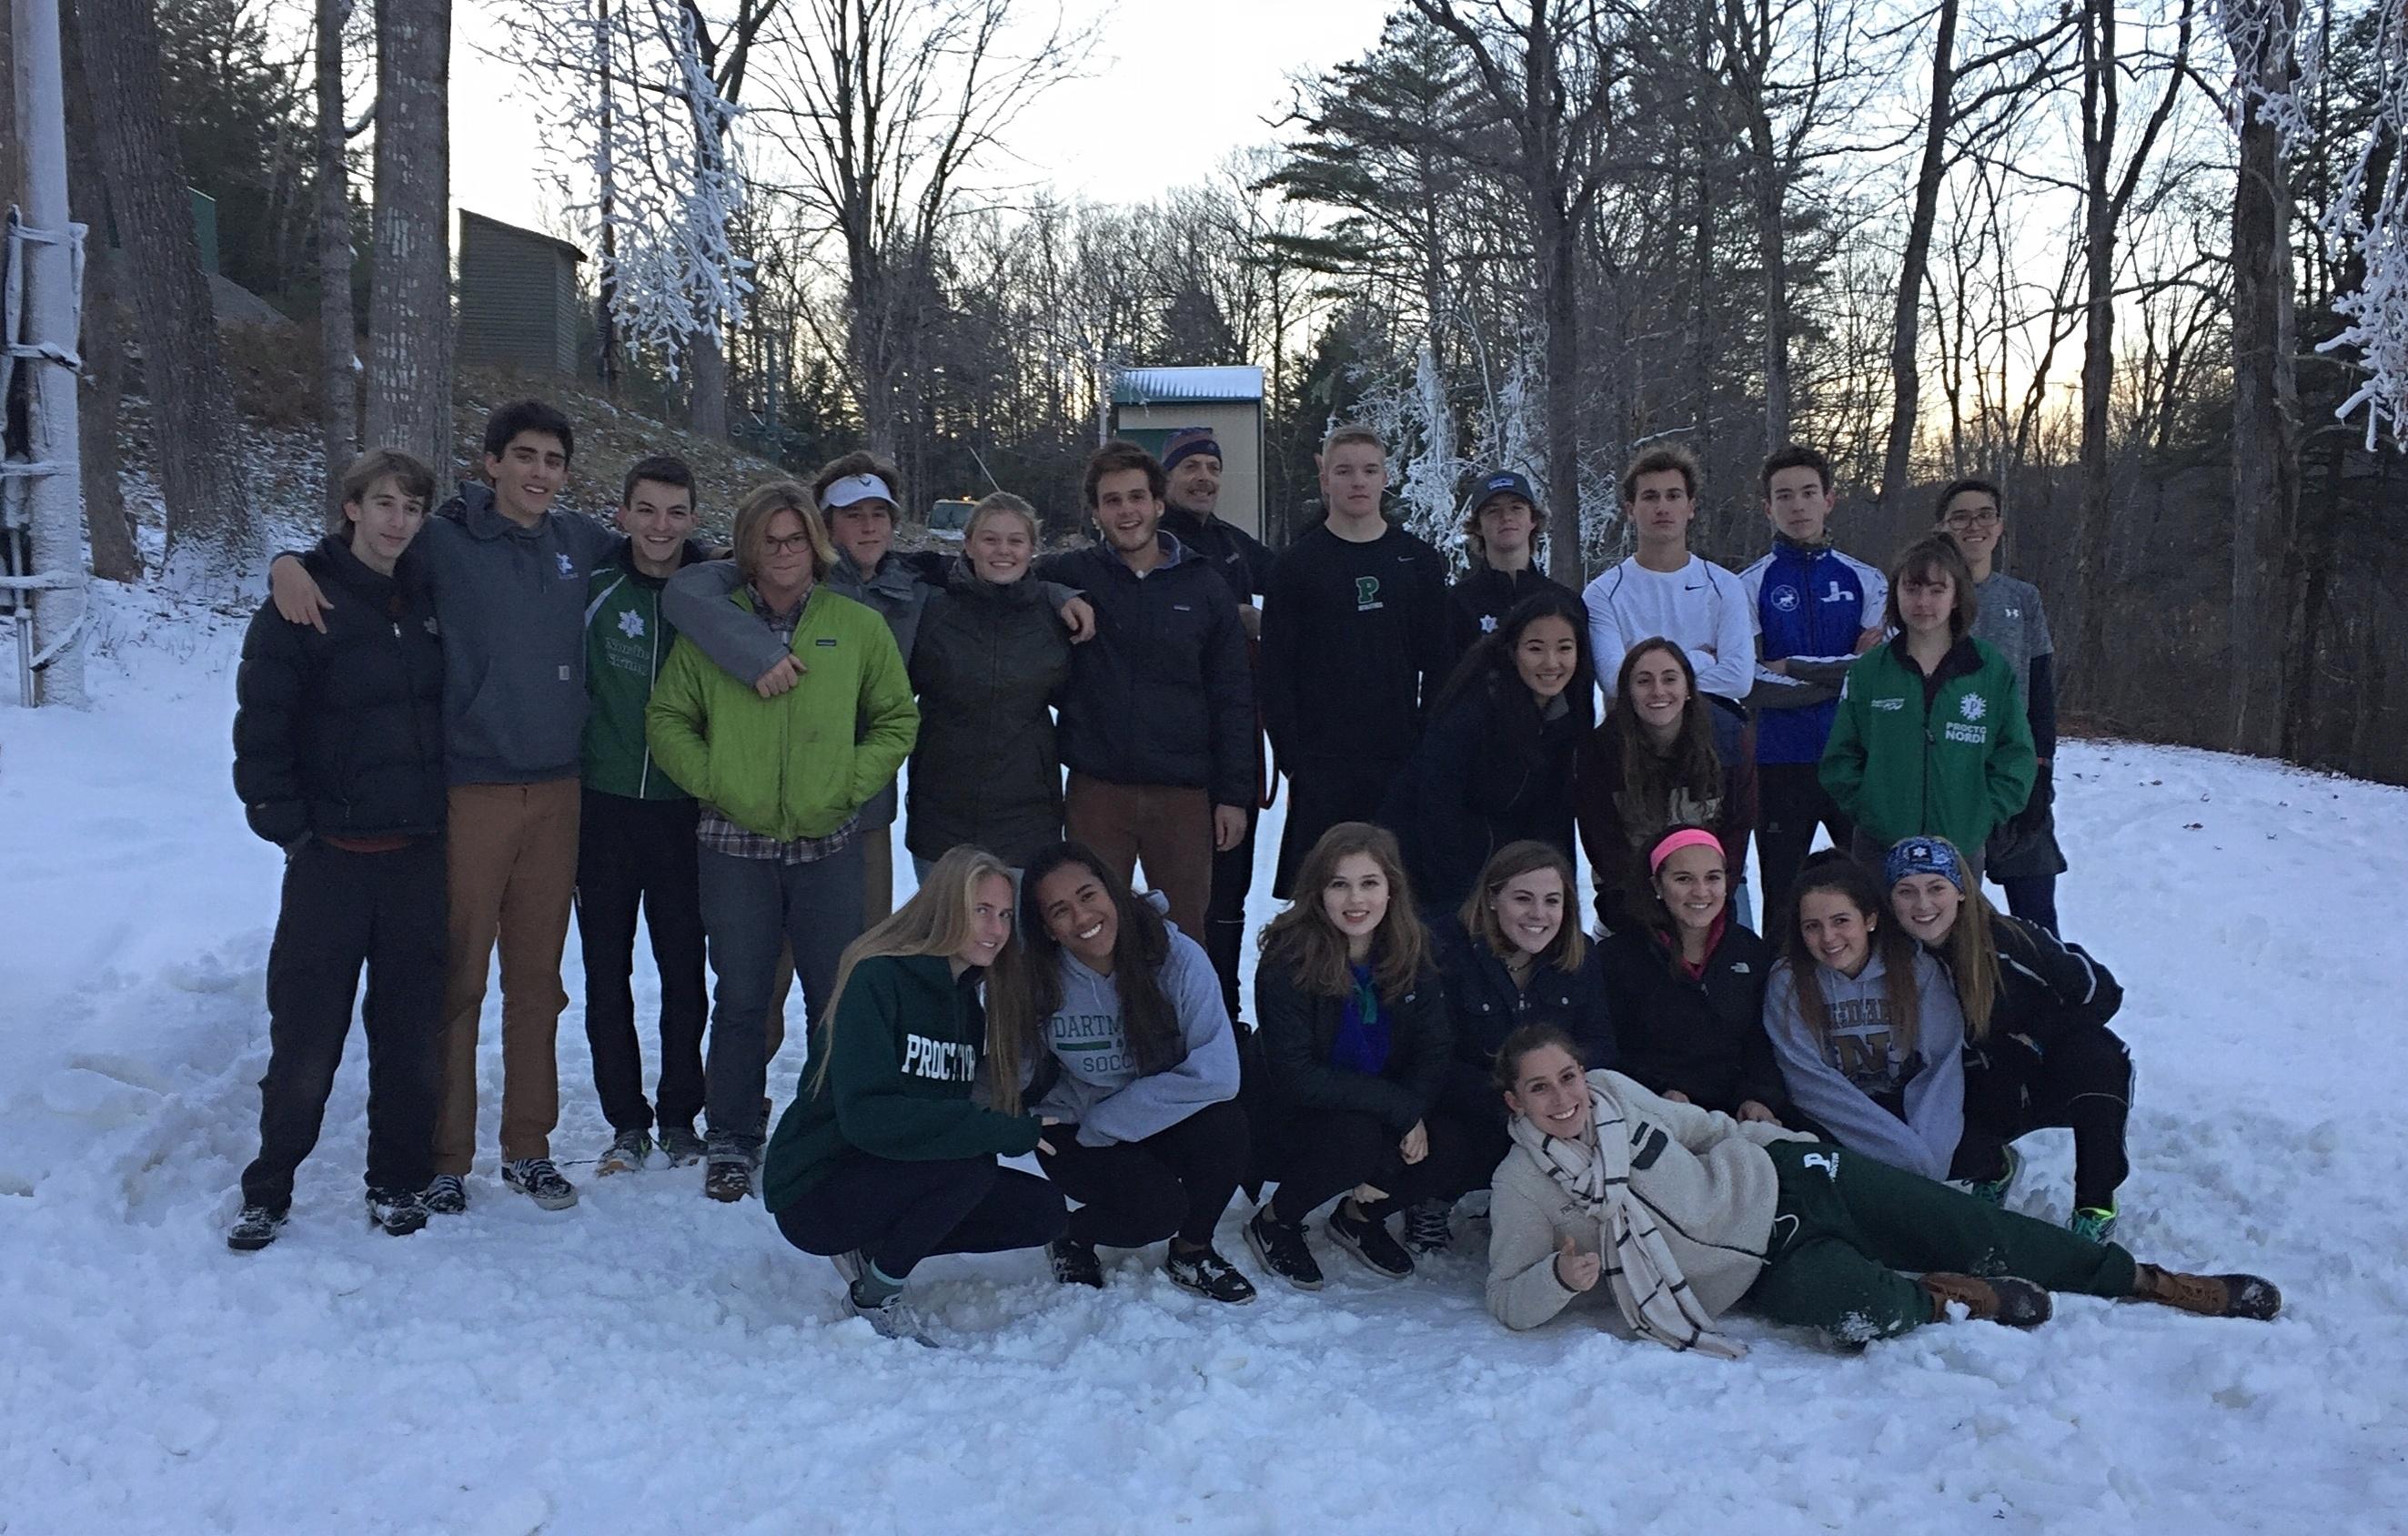 Proctor Academy on snow nordic ski program